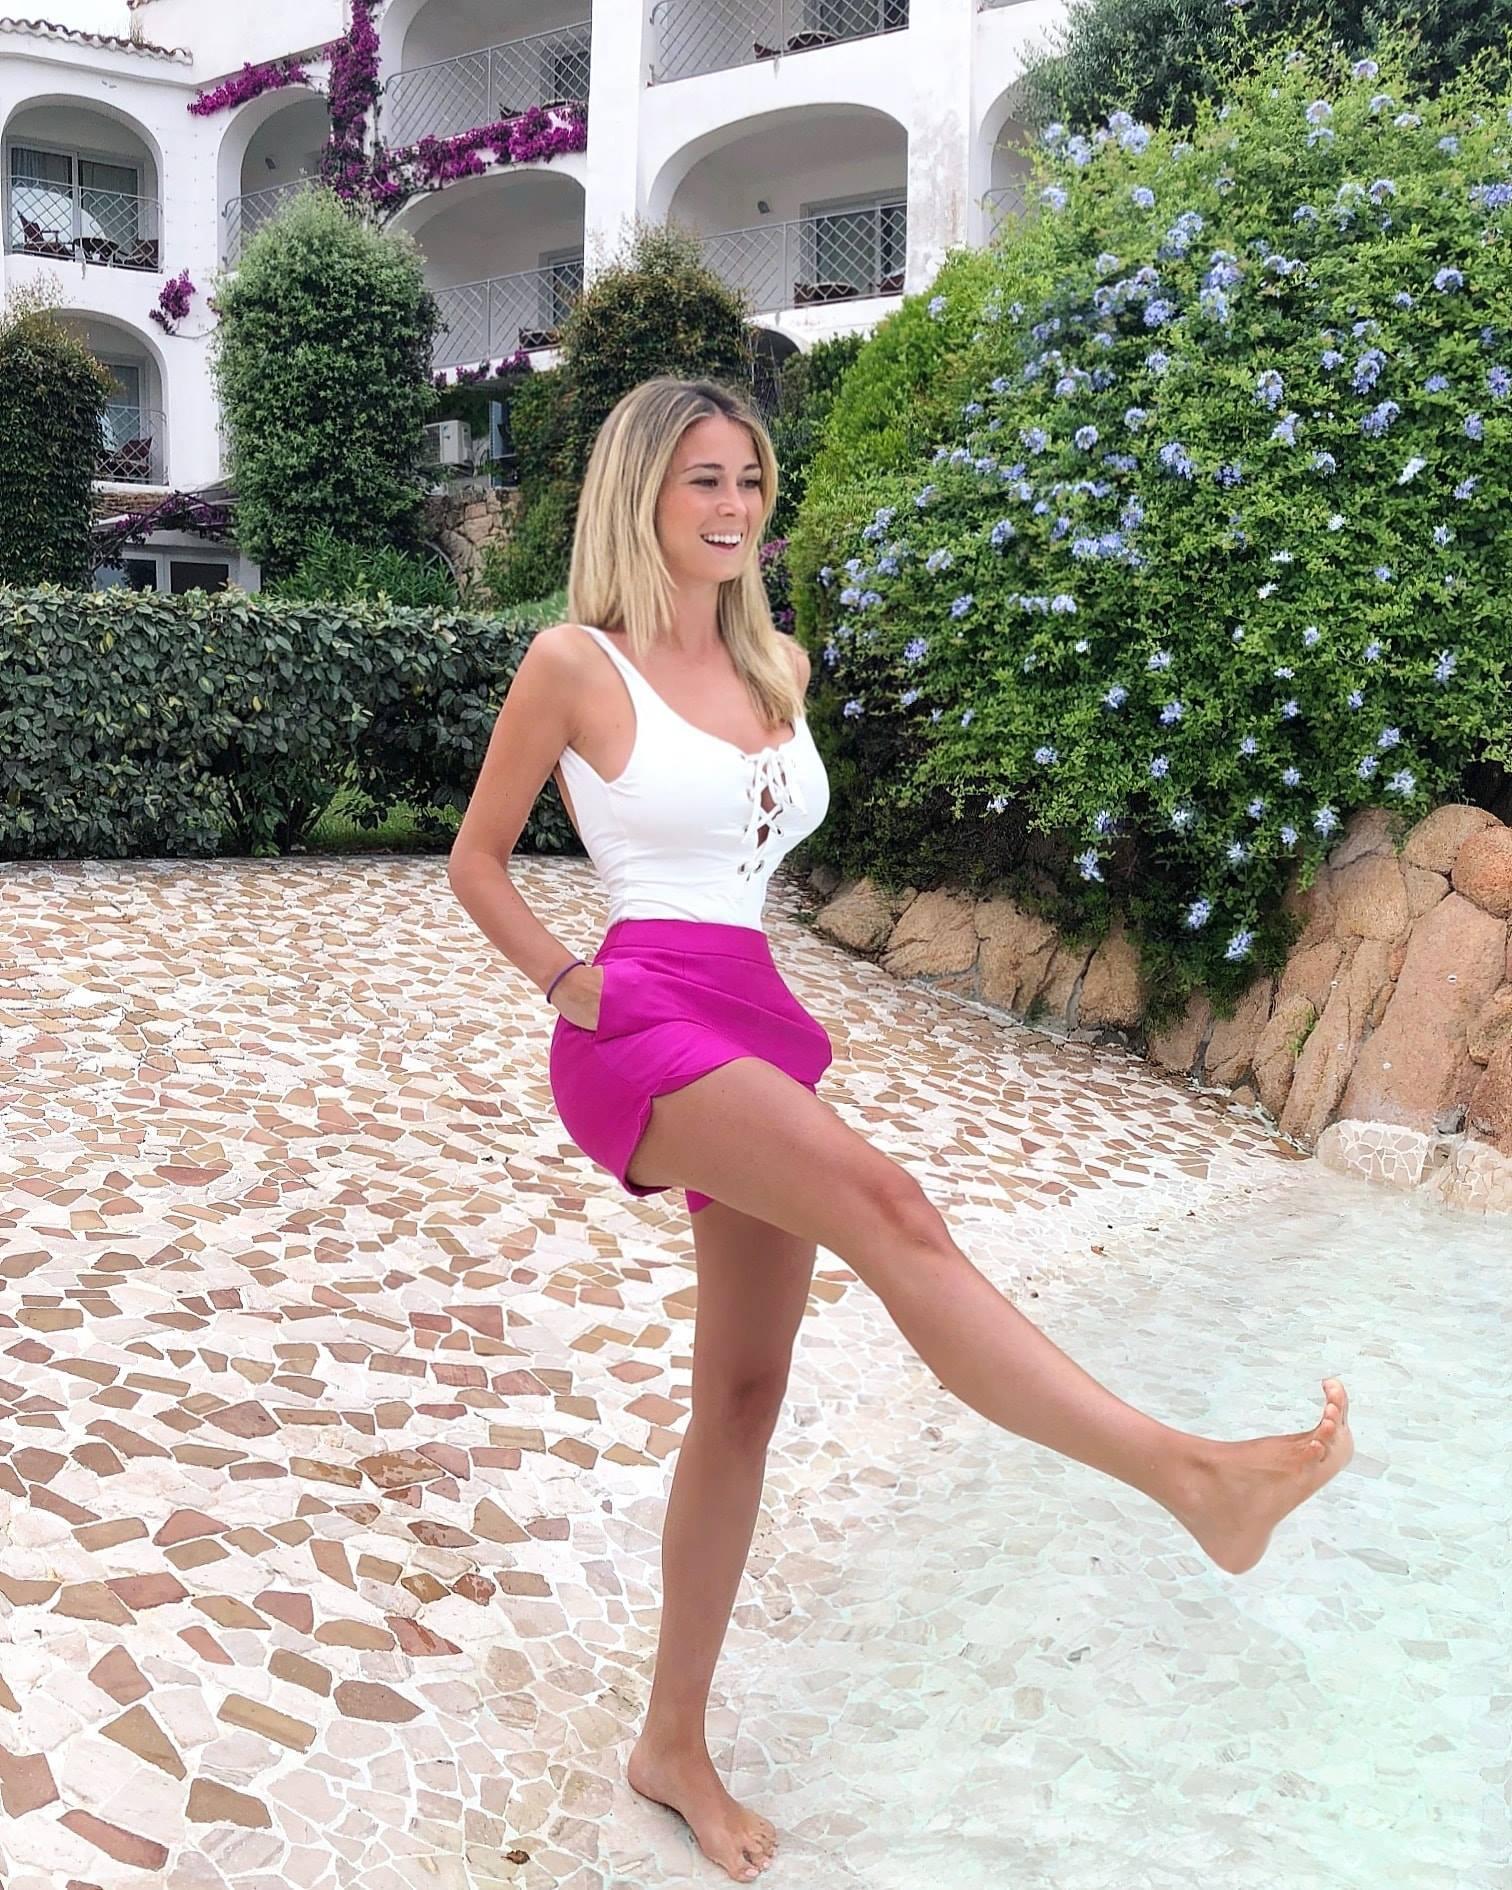 Feet diletta leotta nudes (43 pics), Is a cute